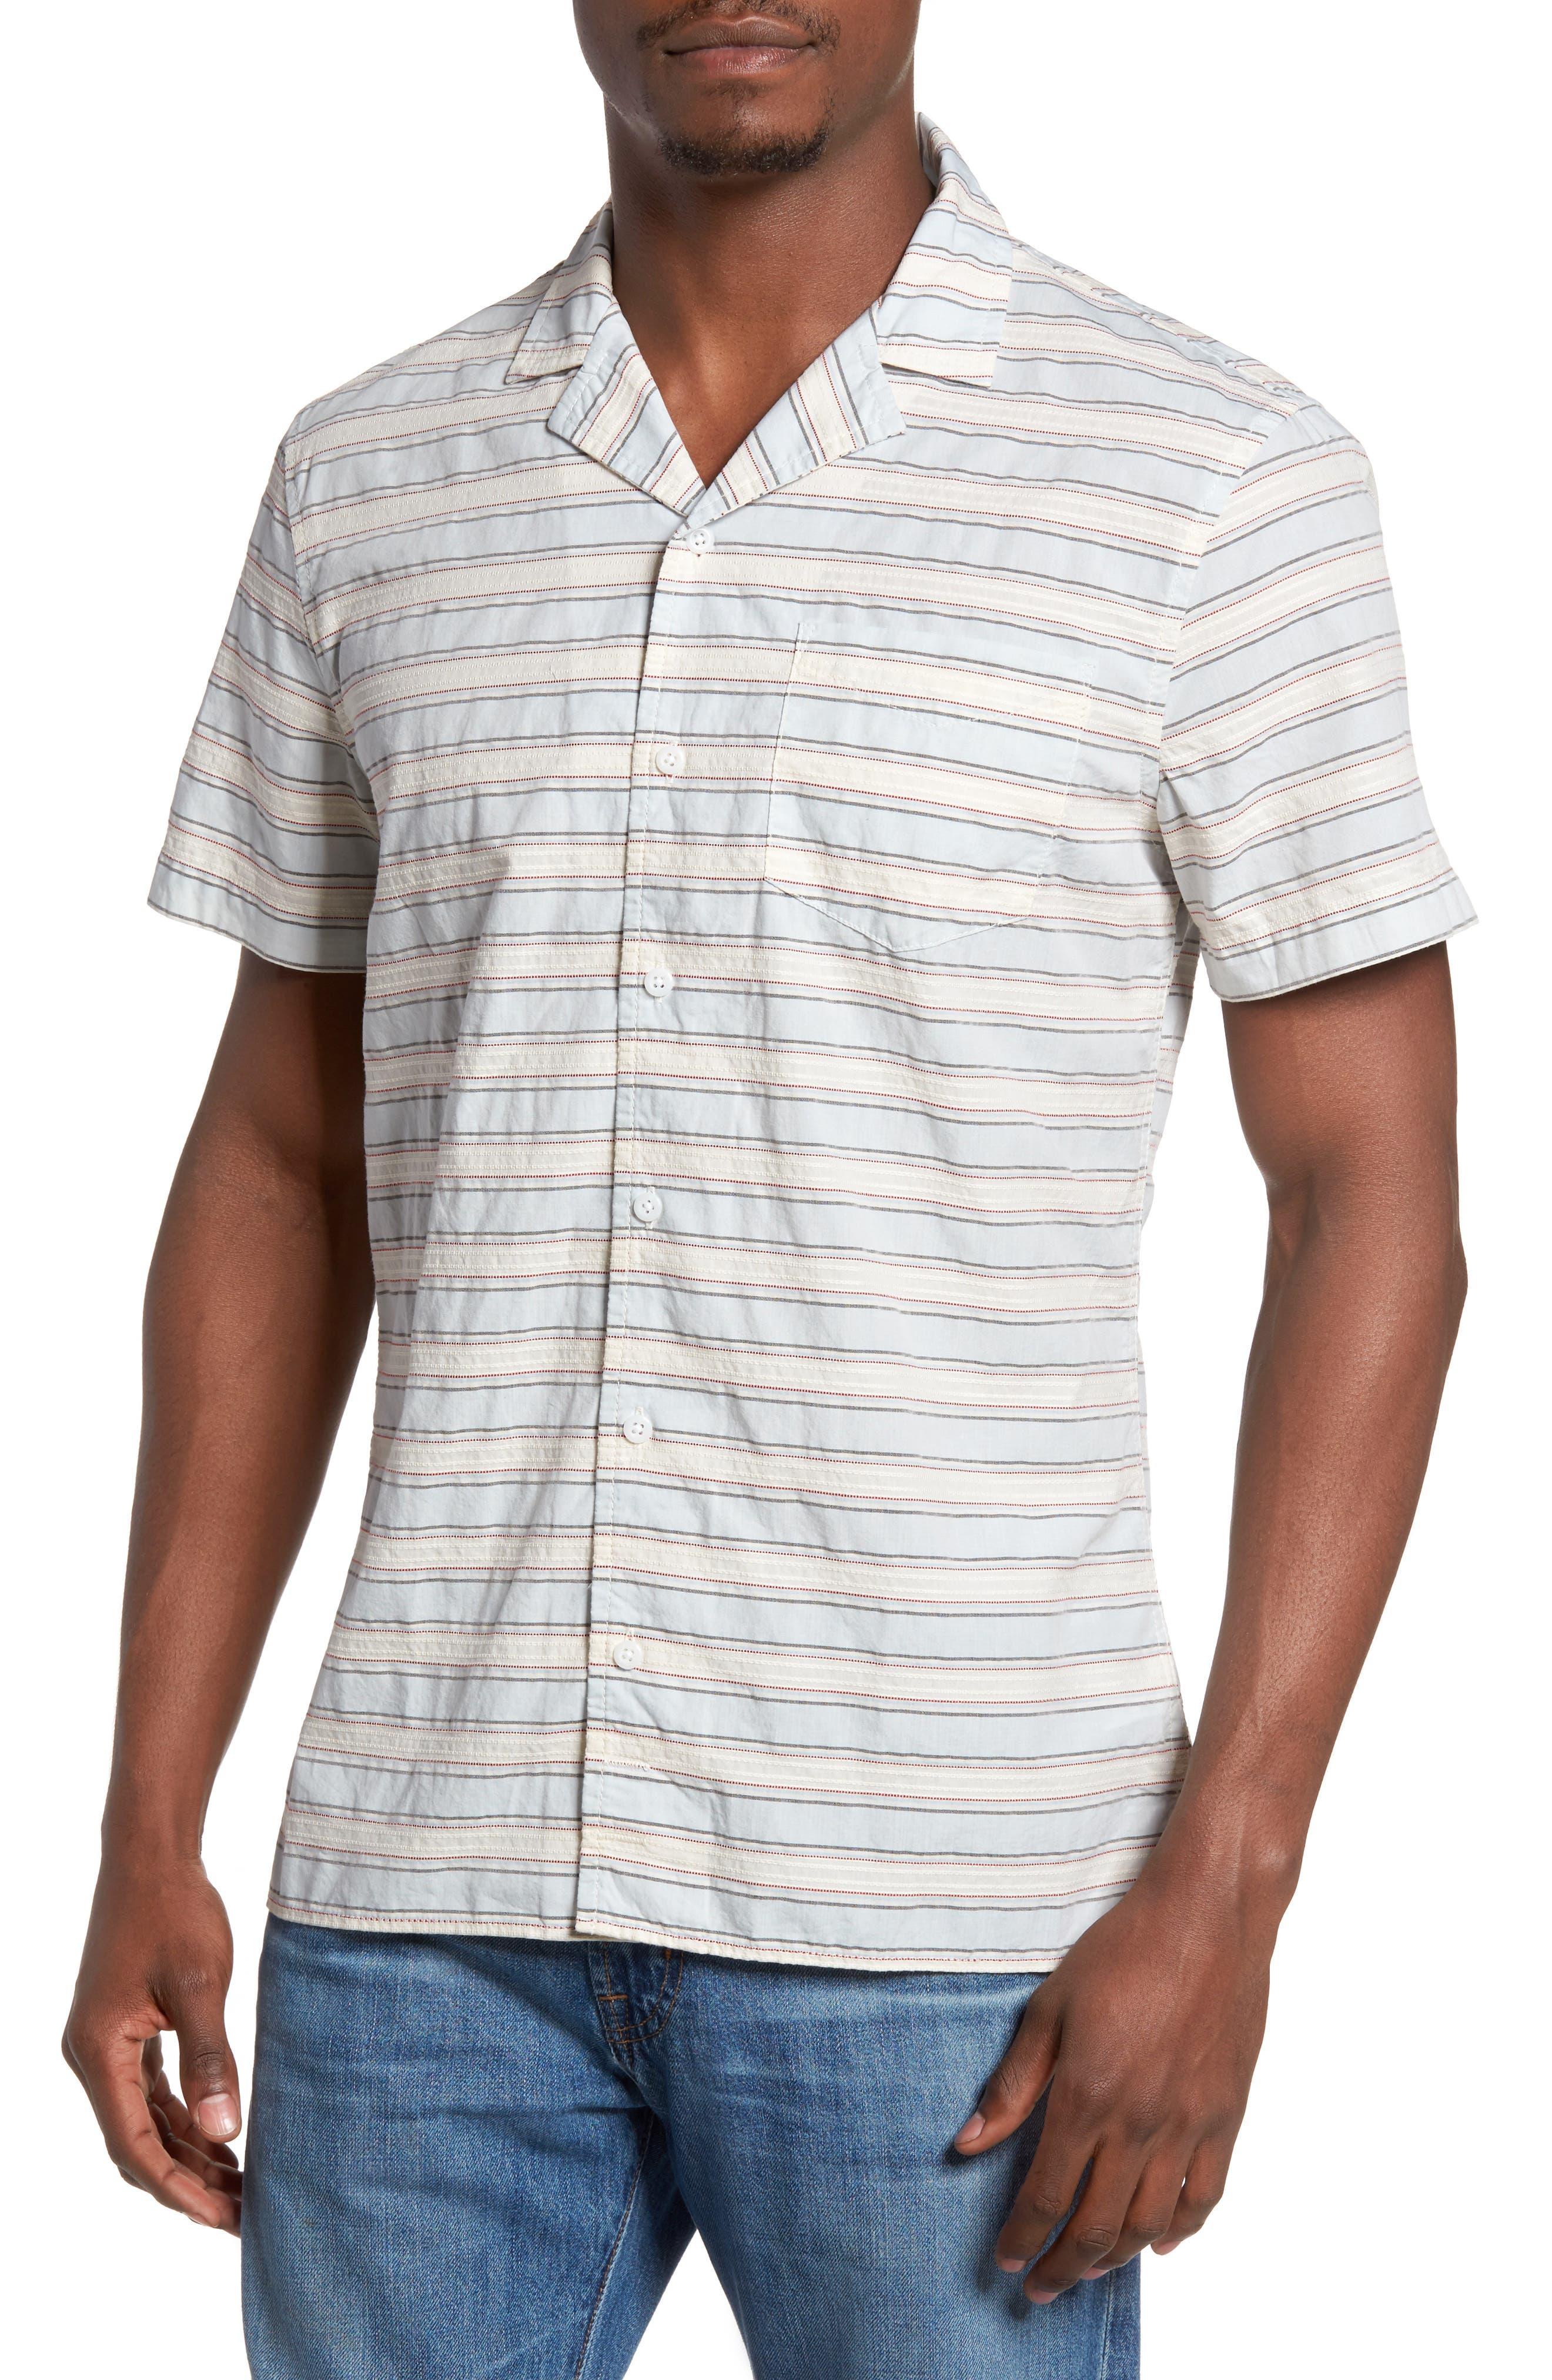 Alternate Image 1 Selected - 1901 Jacquard Stripe Camp Shirt